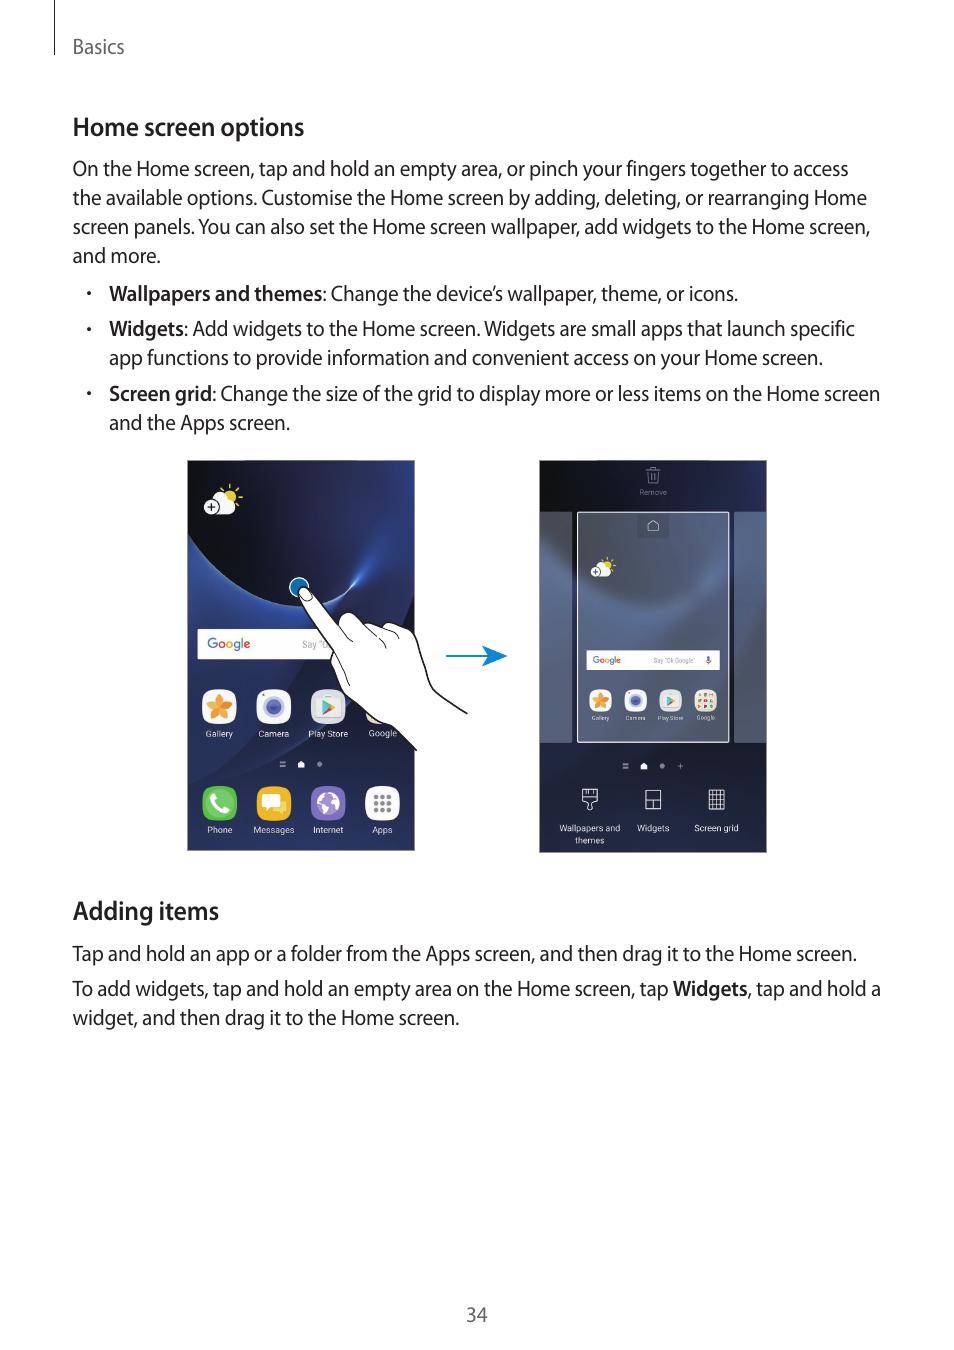 Home screen options, Adding items | Samsung SM-G930F User